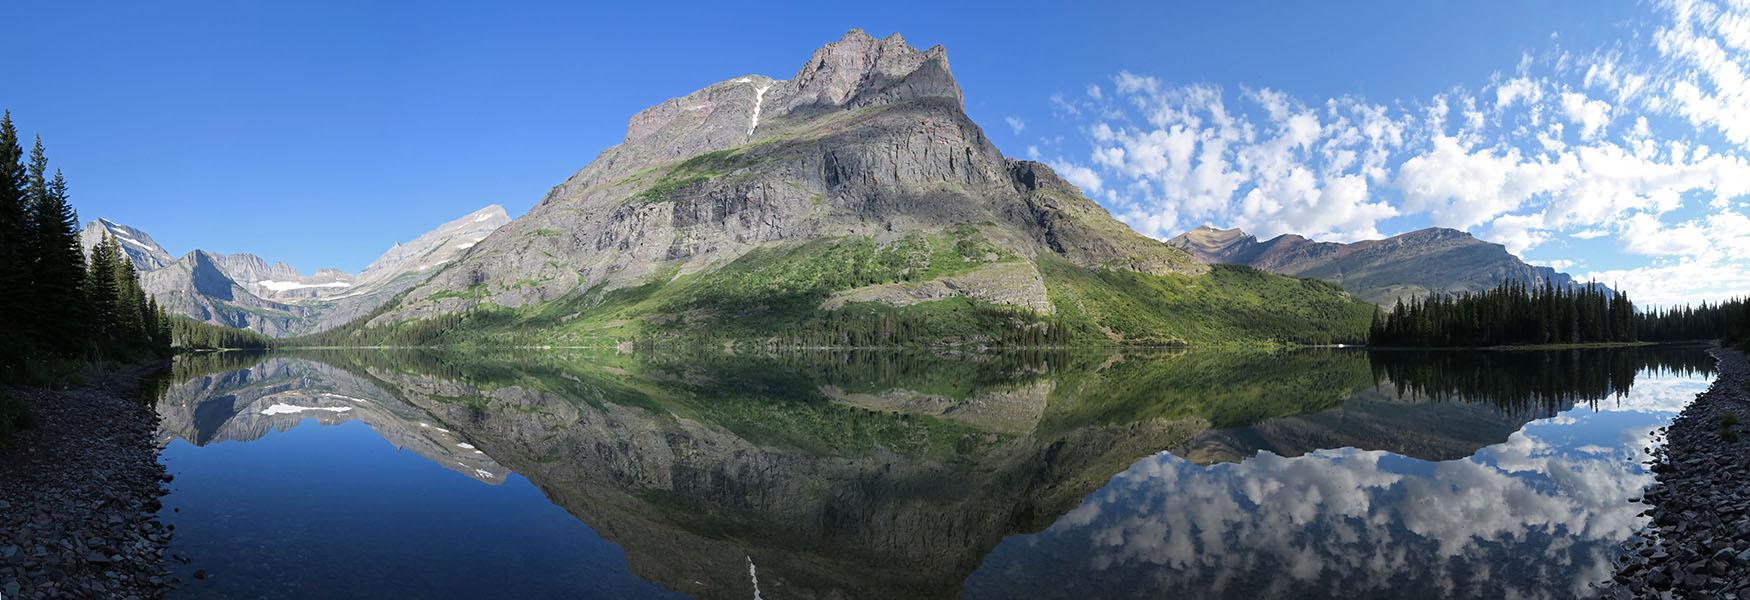 Lake Josephine panorama [South Shore Lake Josephine Trail, Glacier National Park, Montana]